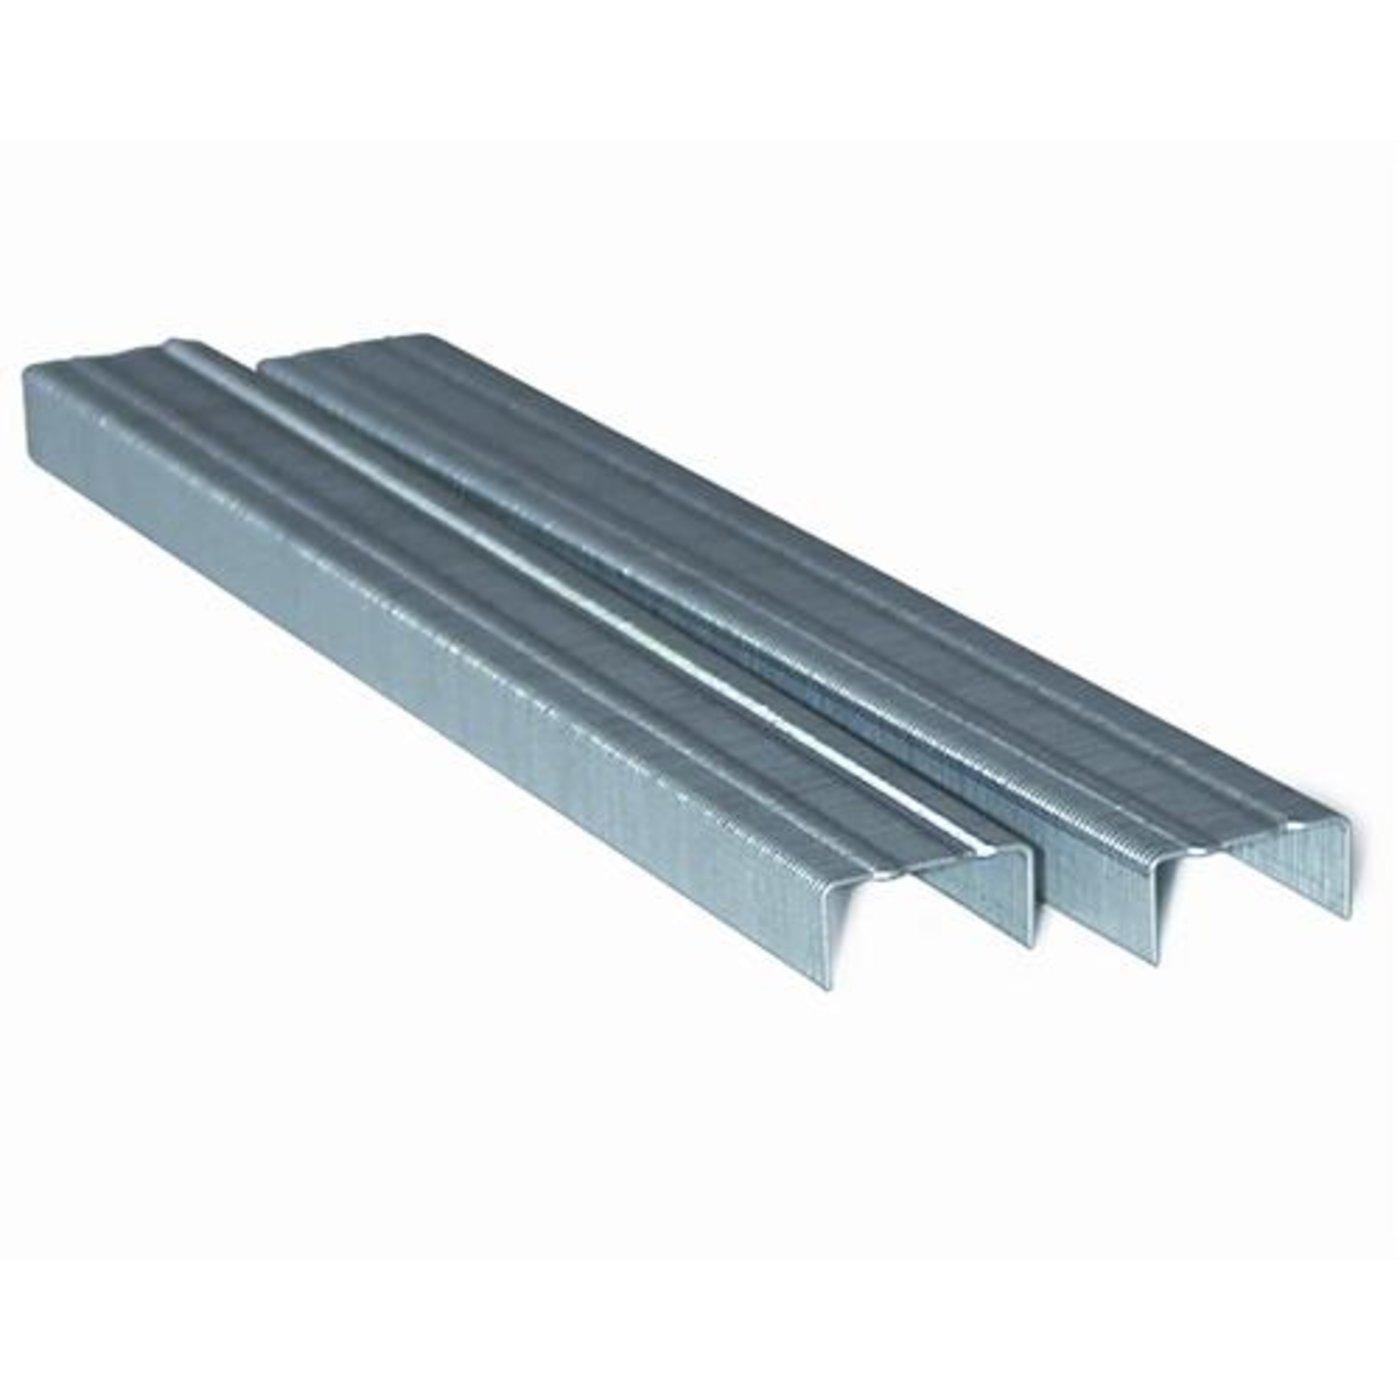 lowest price 741c9 6c9d6 Swingline® Undulated Staples, 1 4